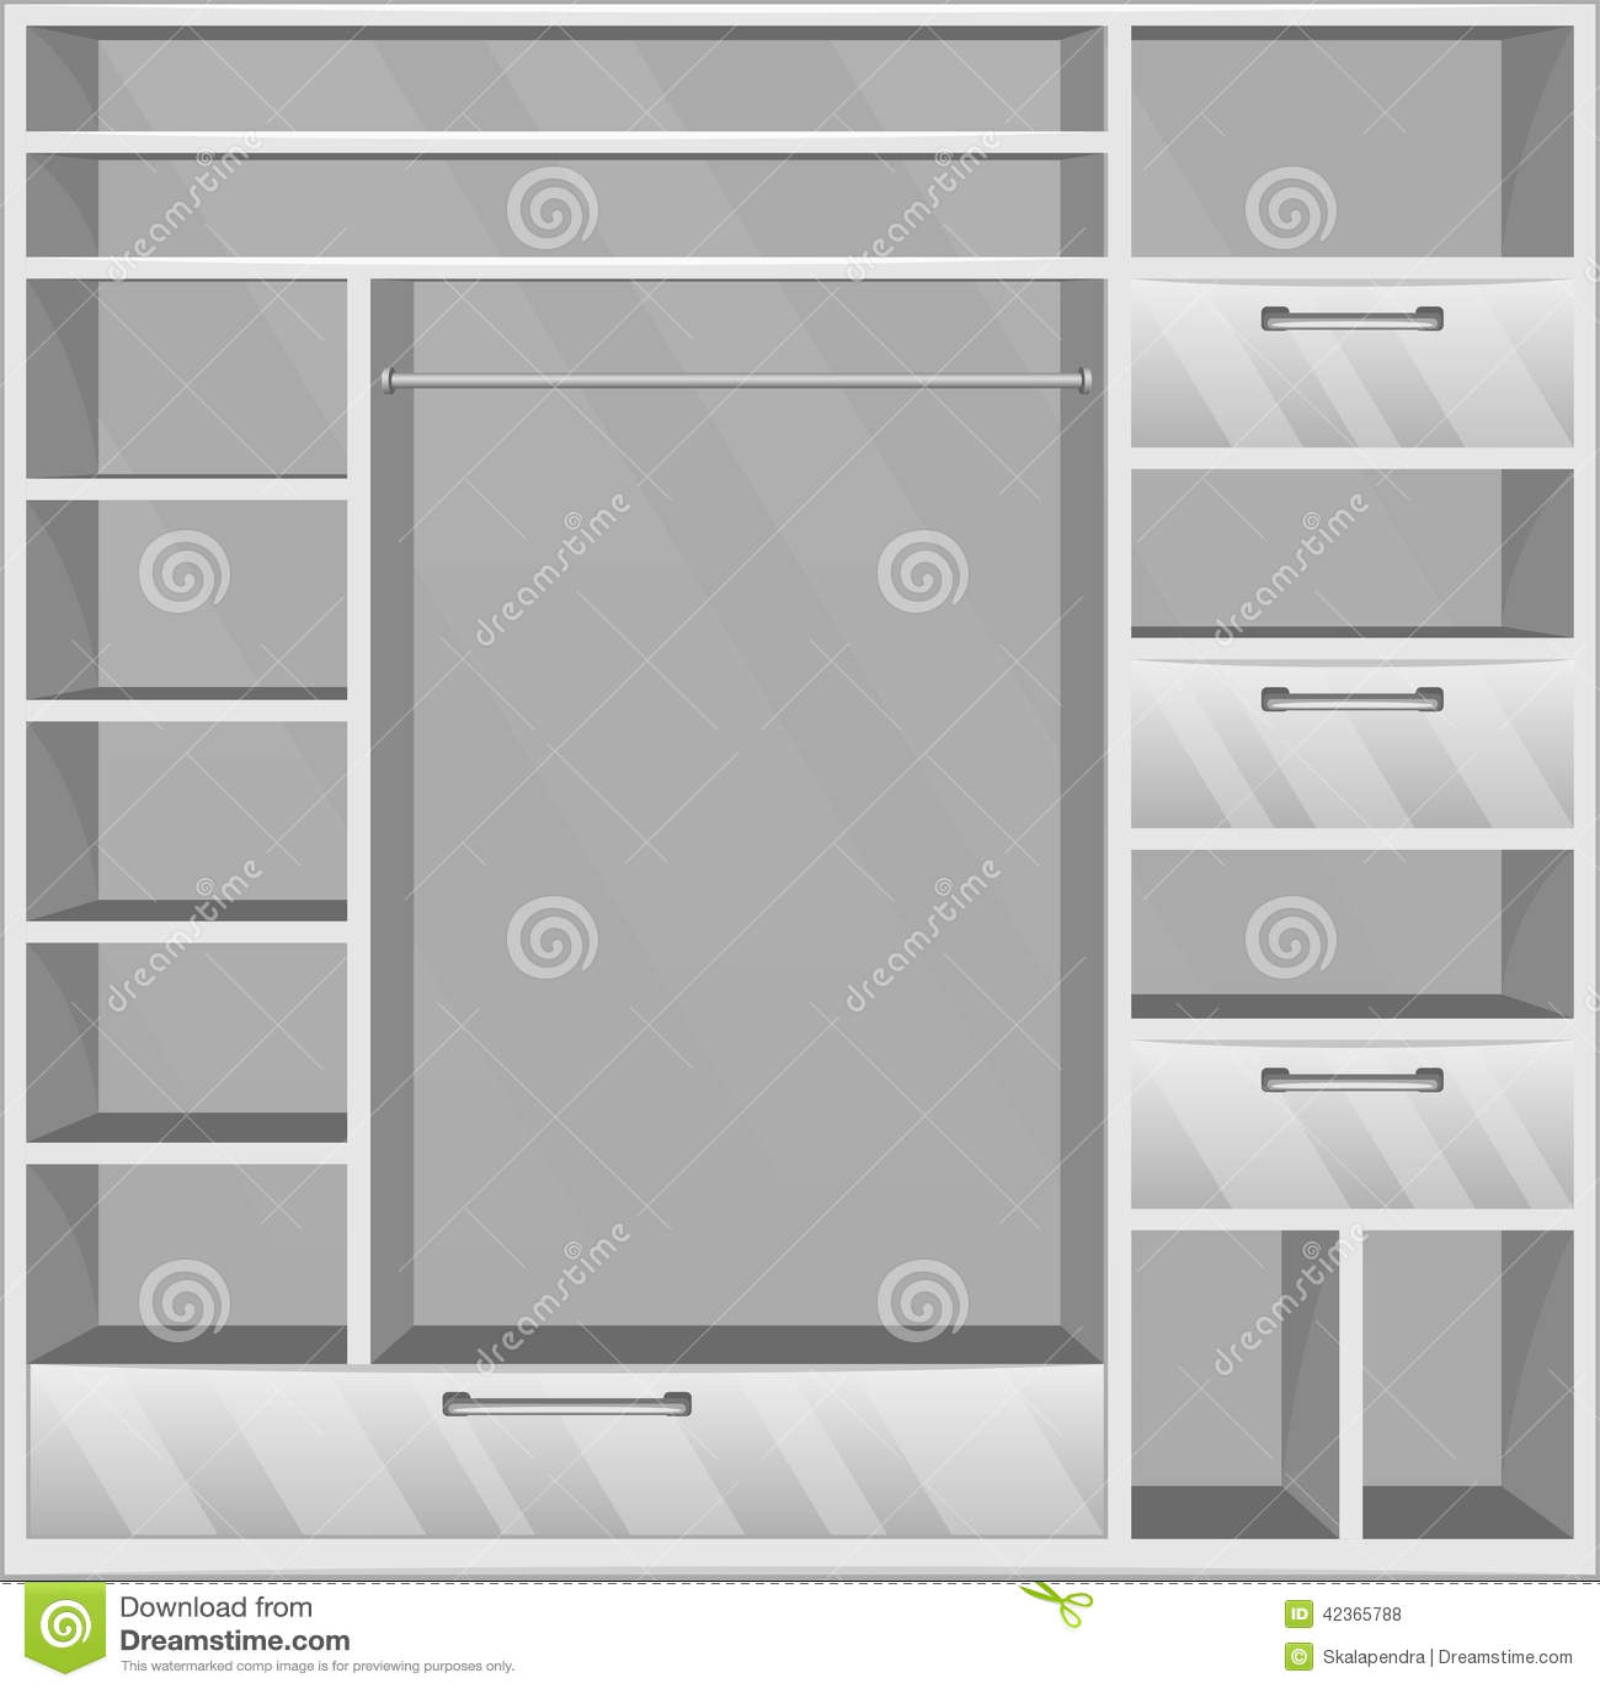 Garderobe Vide Illustration De Vecteur  Image 42365788